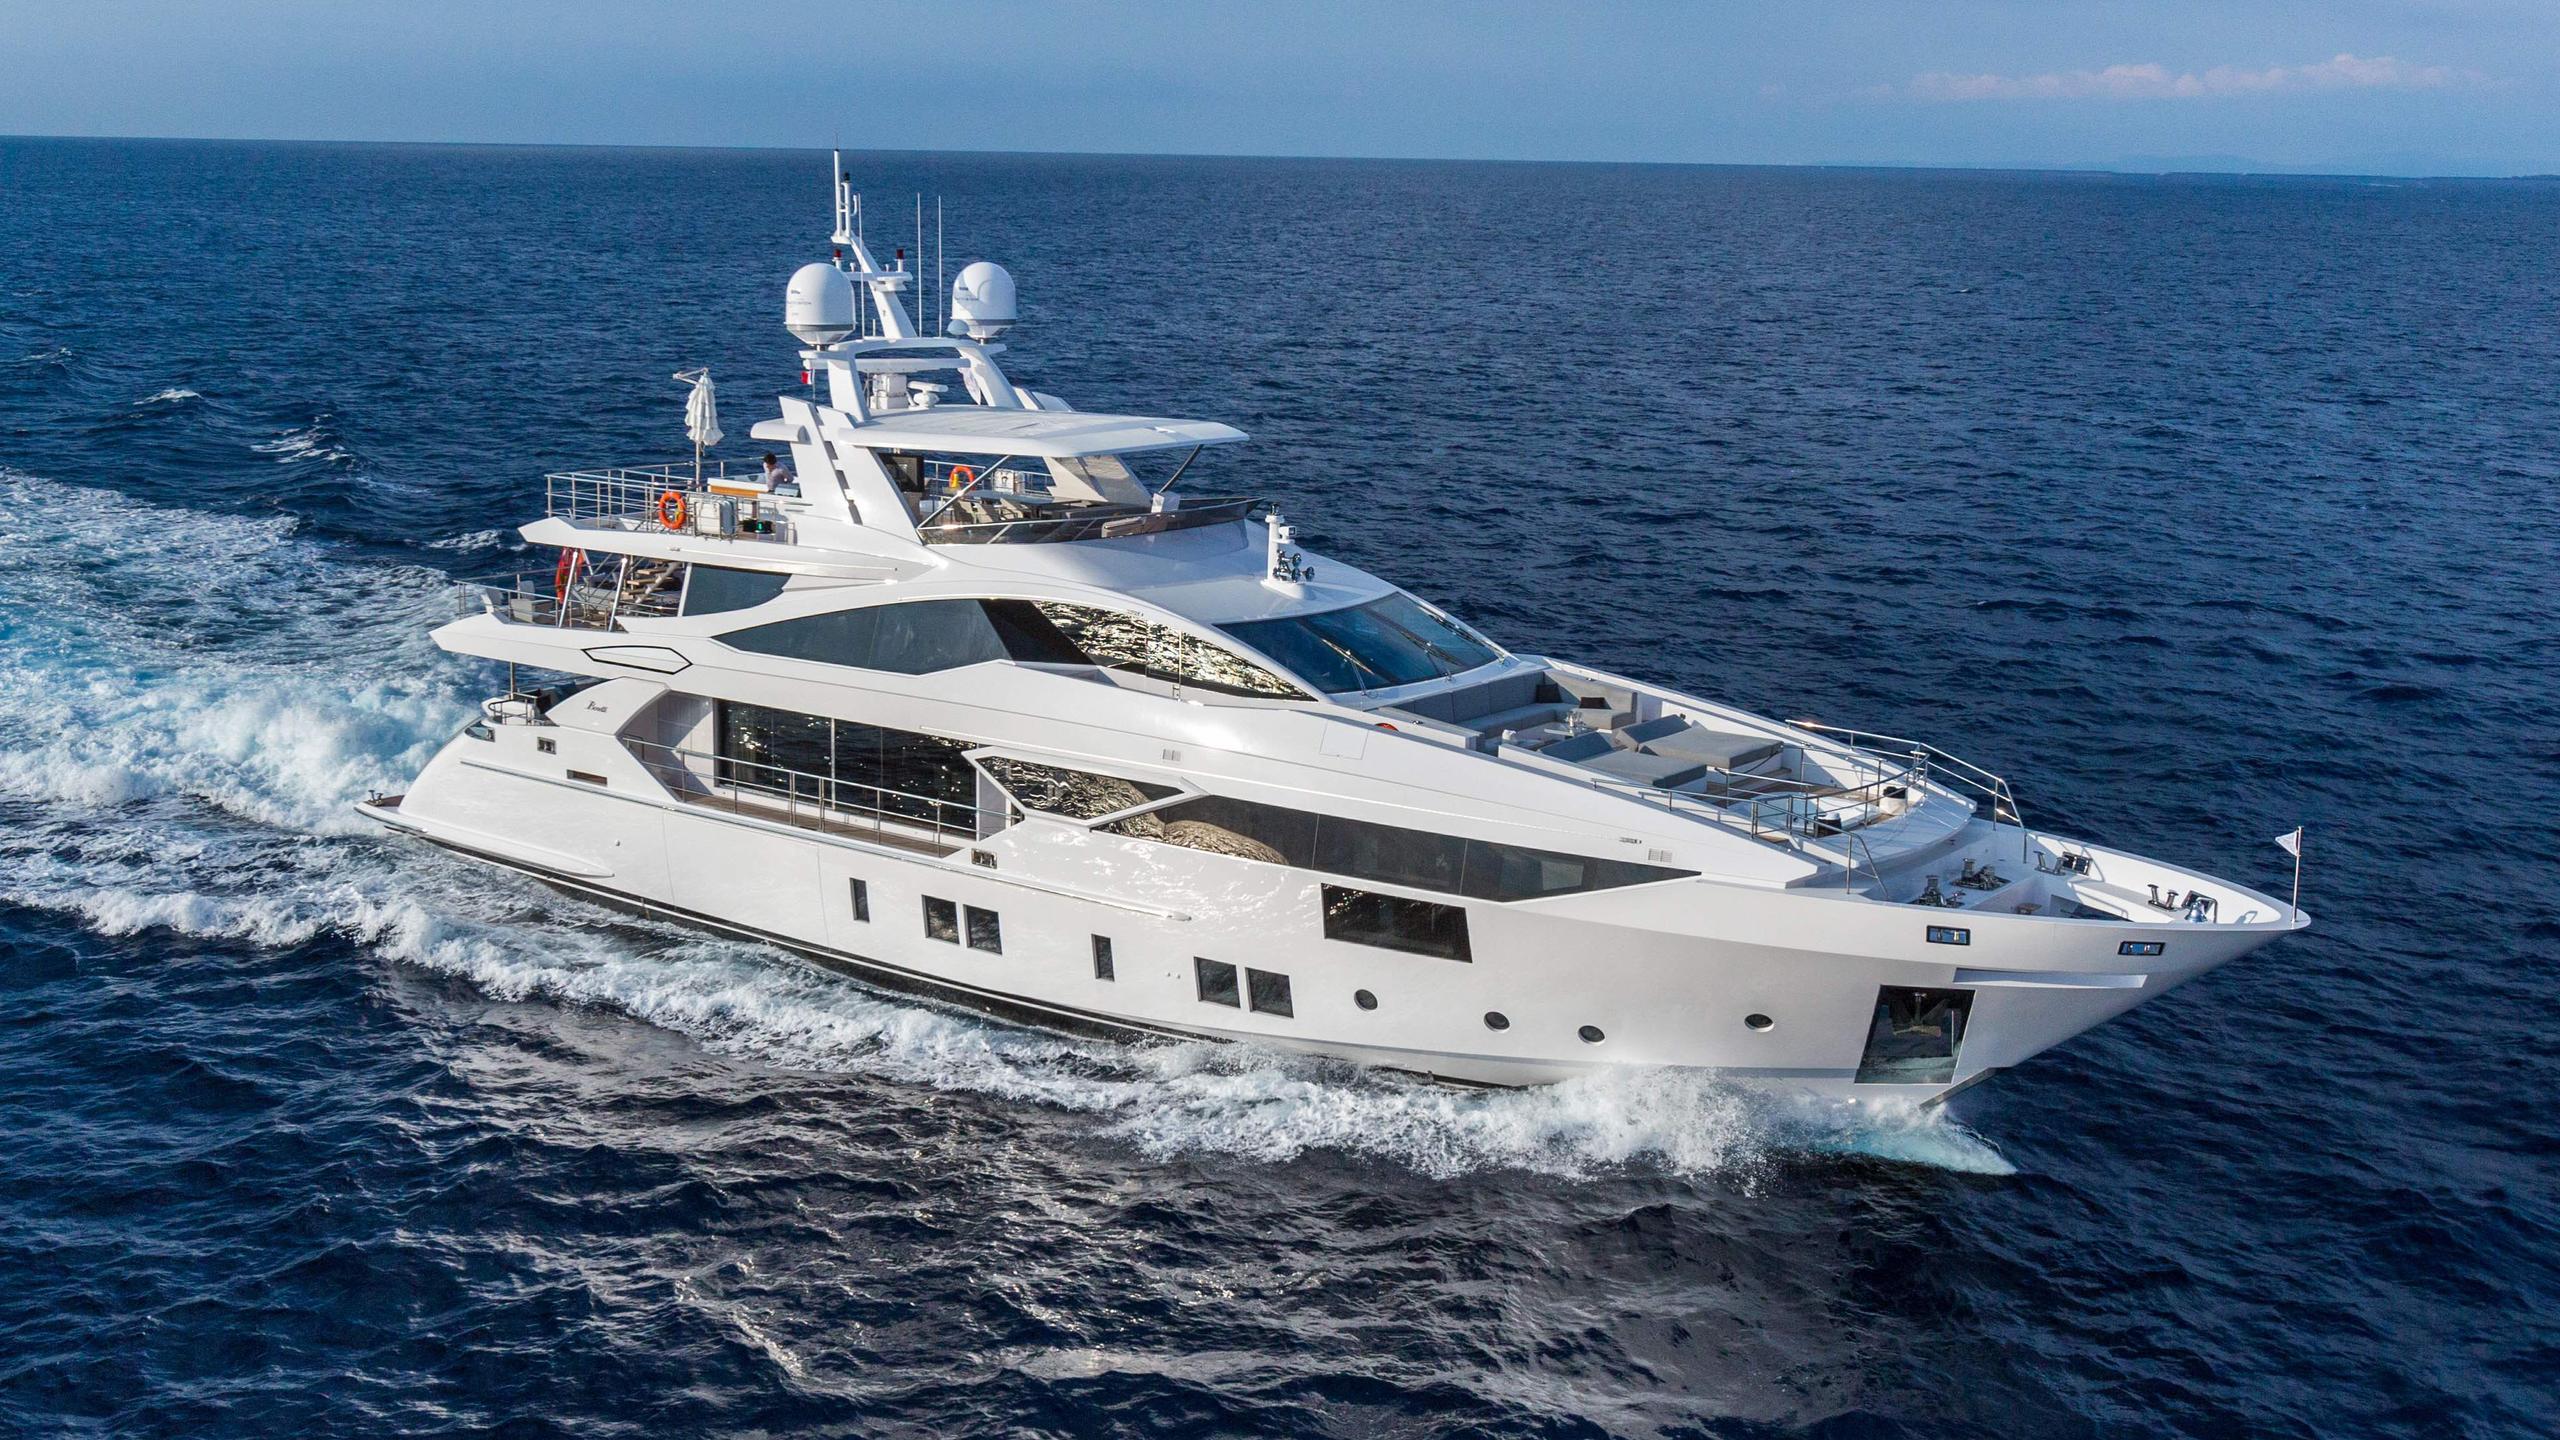 constance joy motoryacht benetti vivace 125 2016 38m running half profile sistership